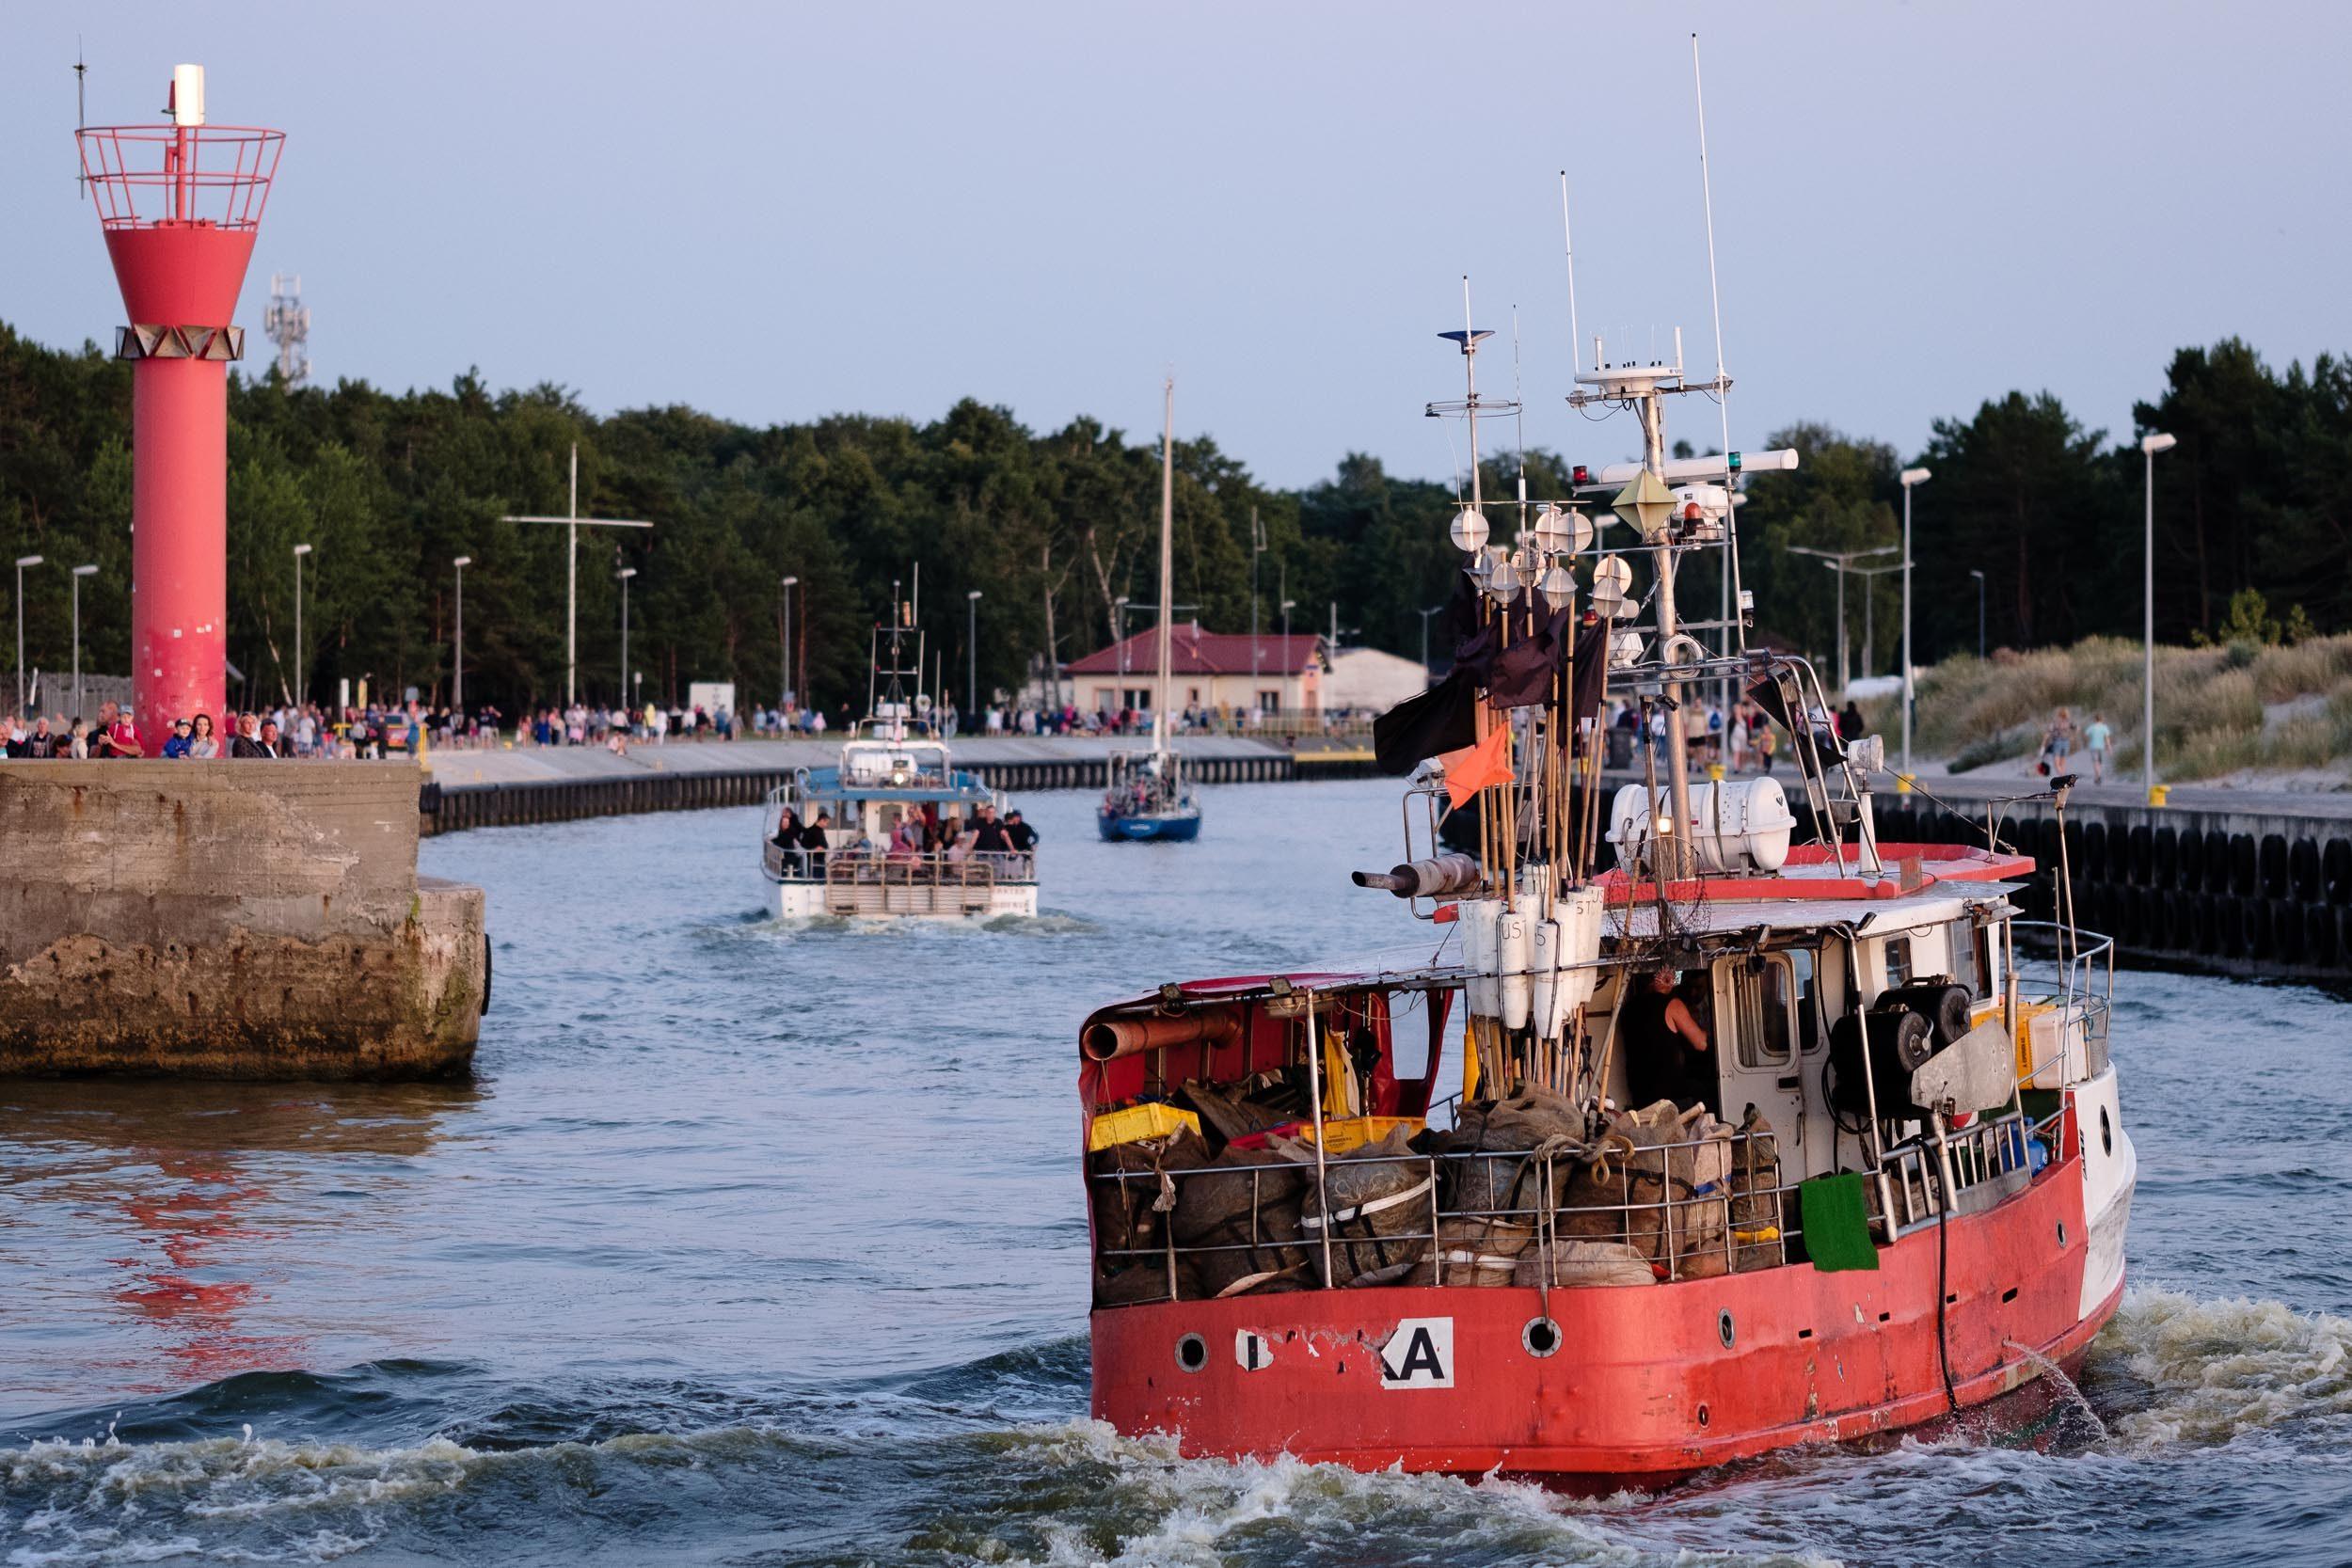 Hafeneinfahrt Leba, Polen